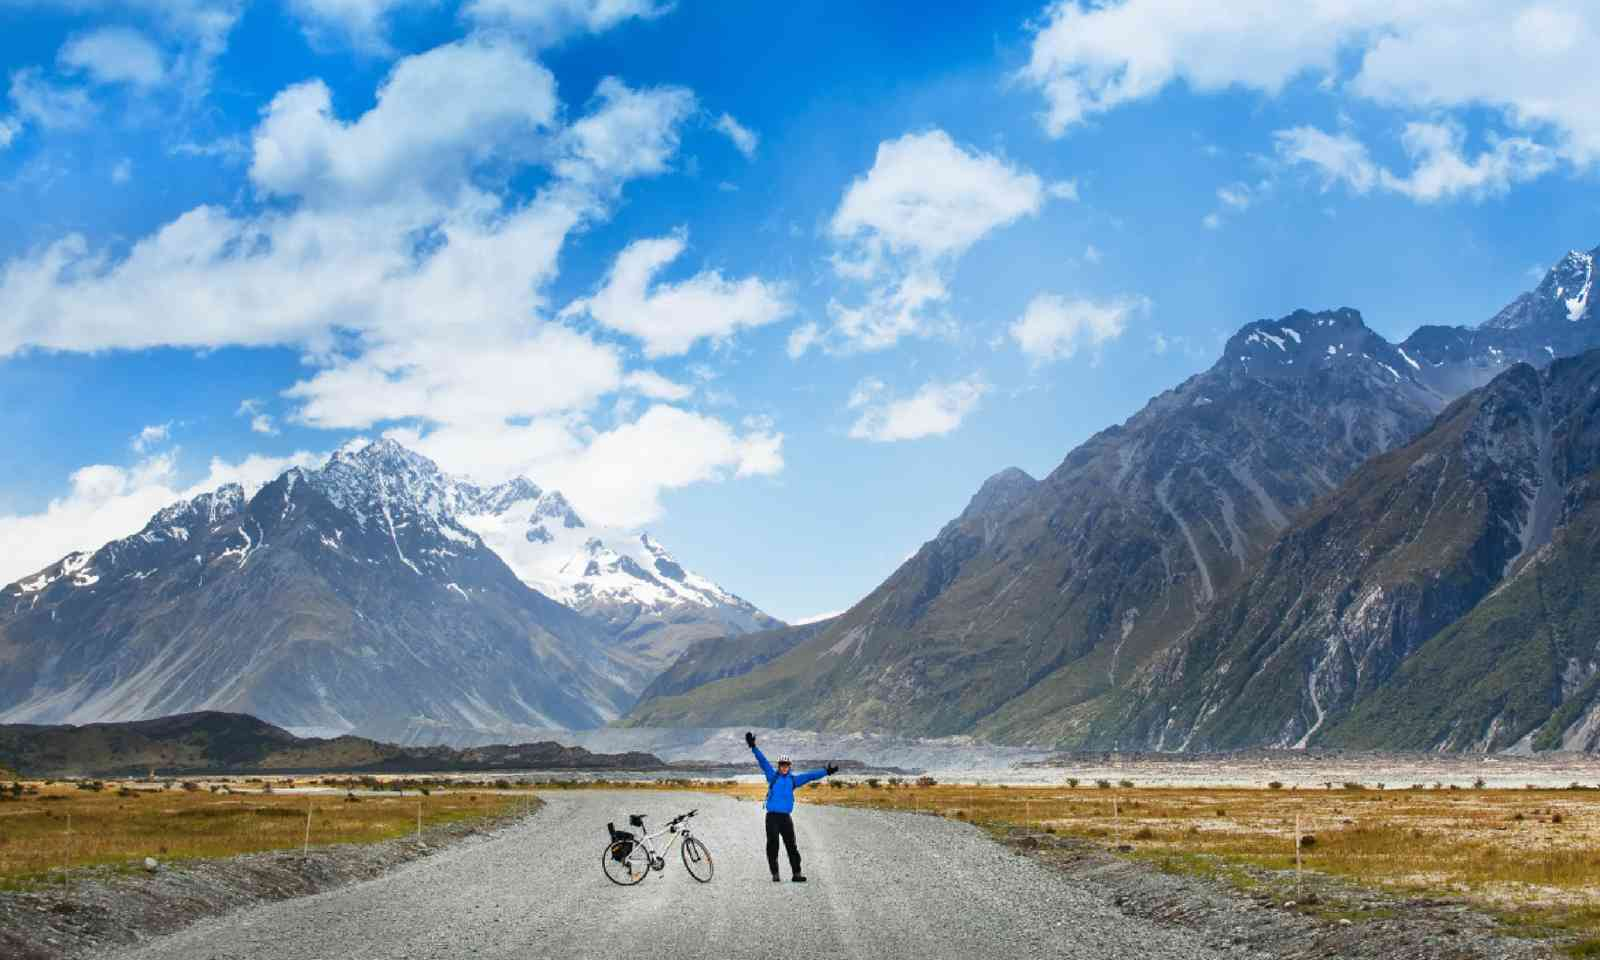 Mountain biking, New Zealand (Shutterstock)